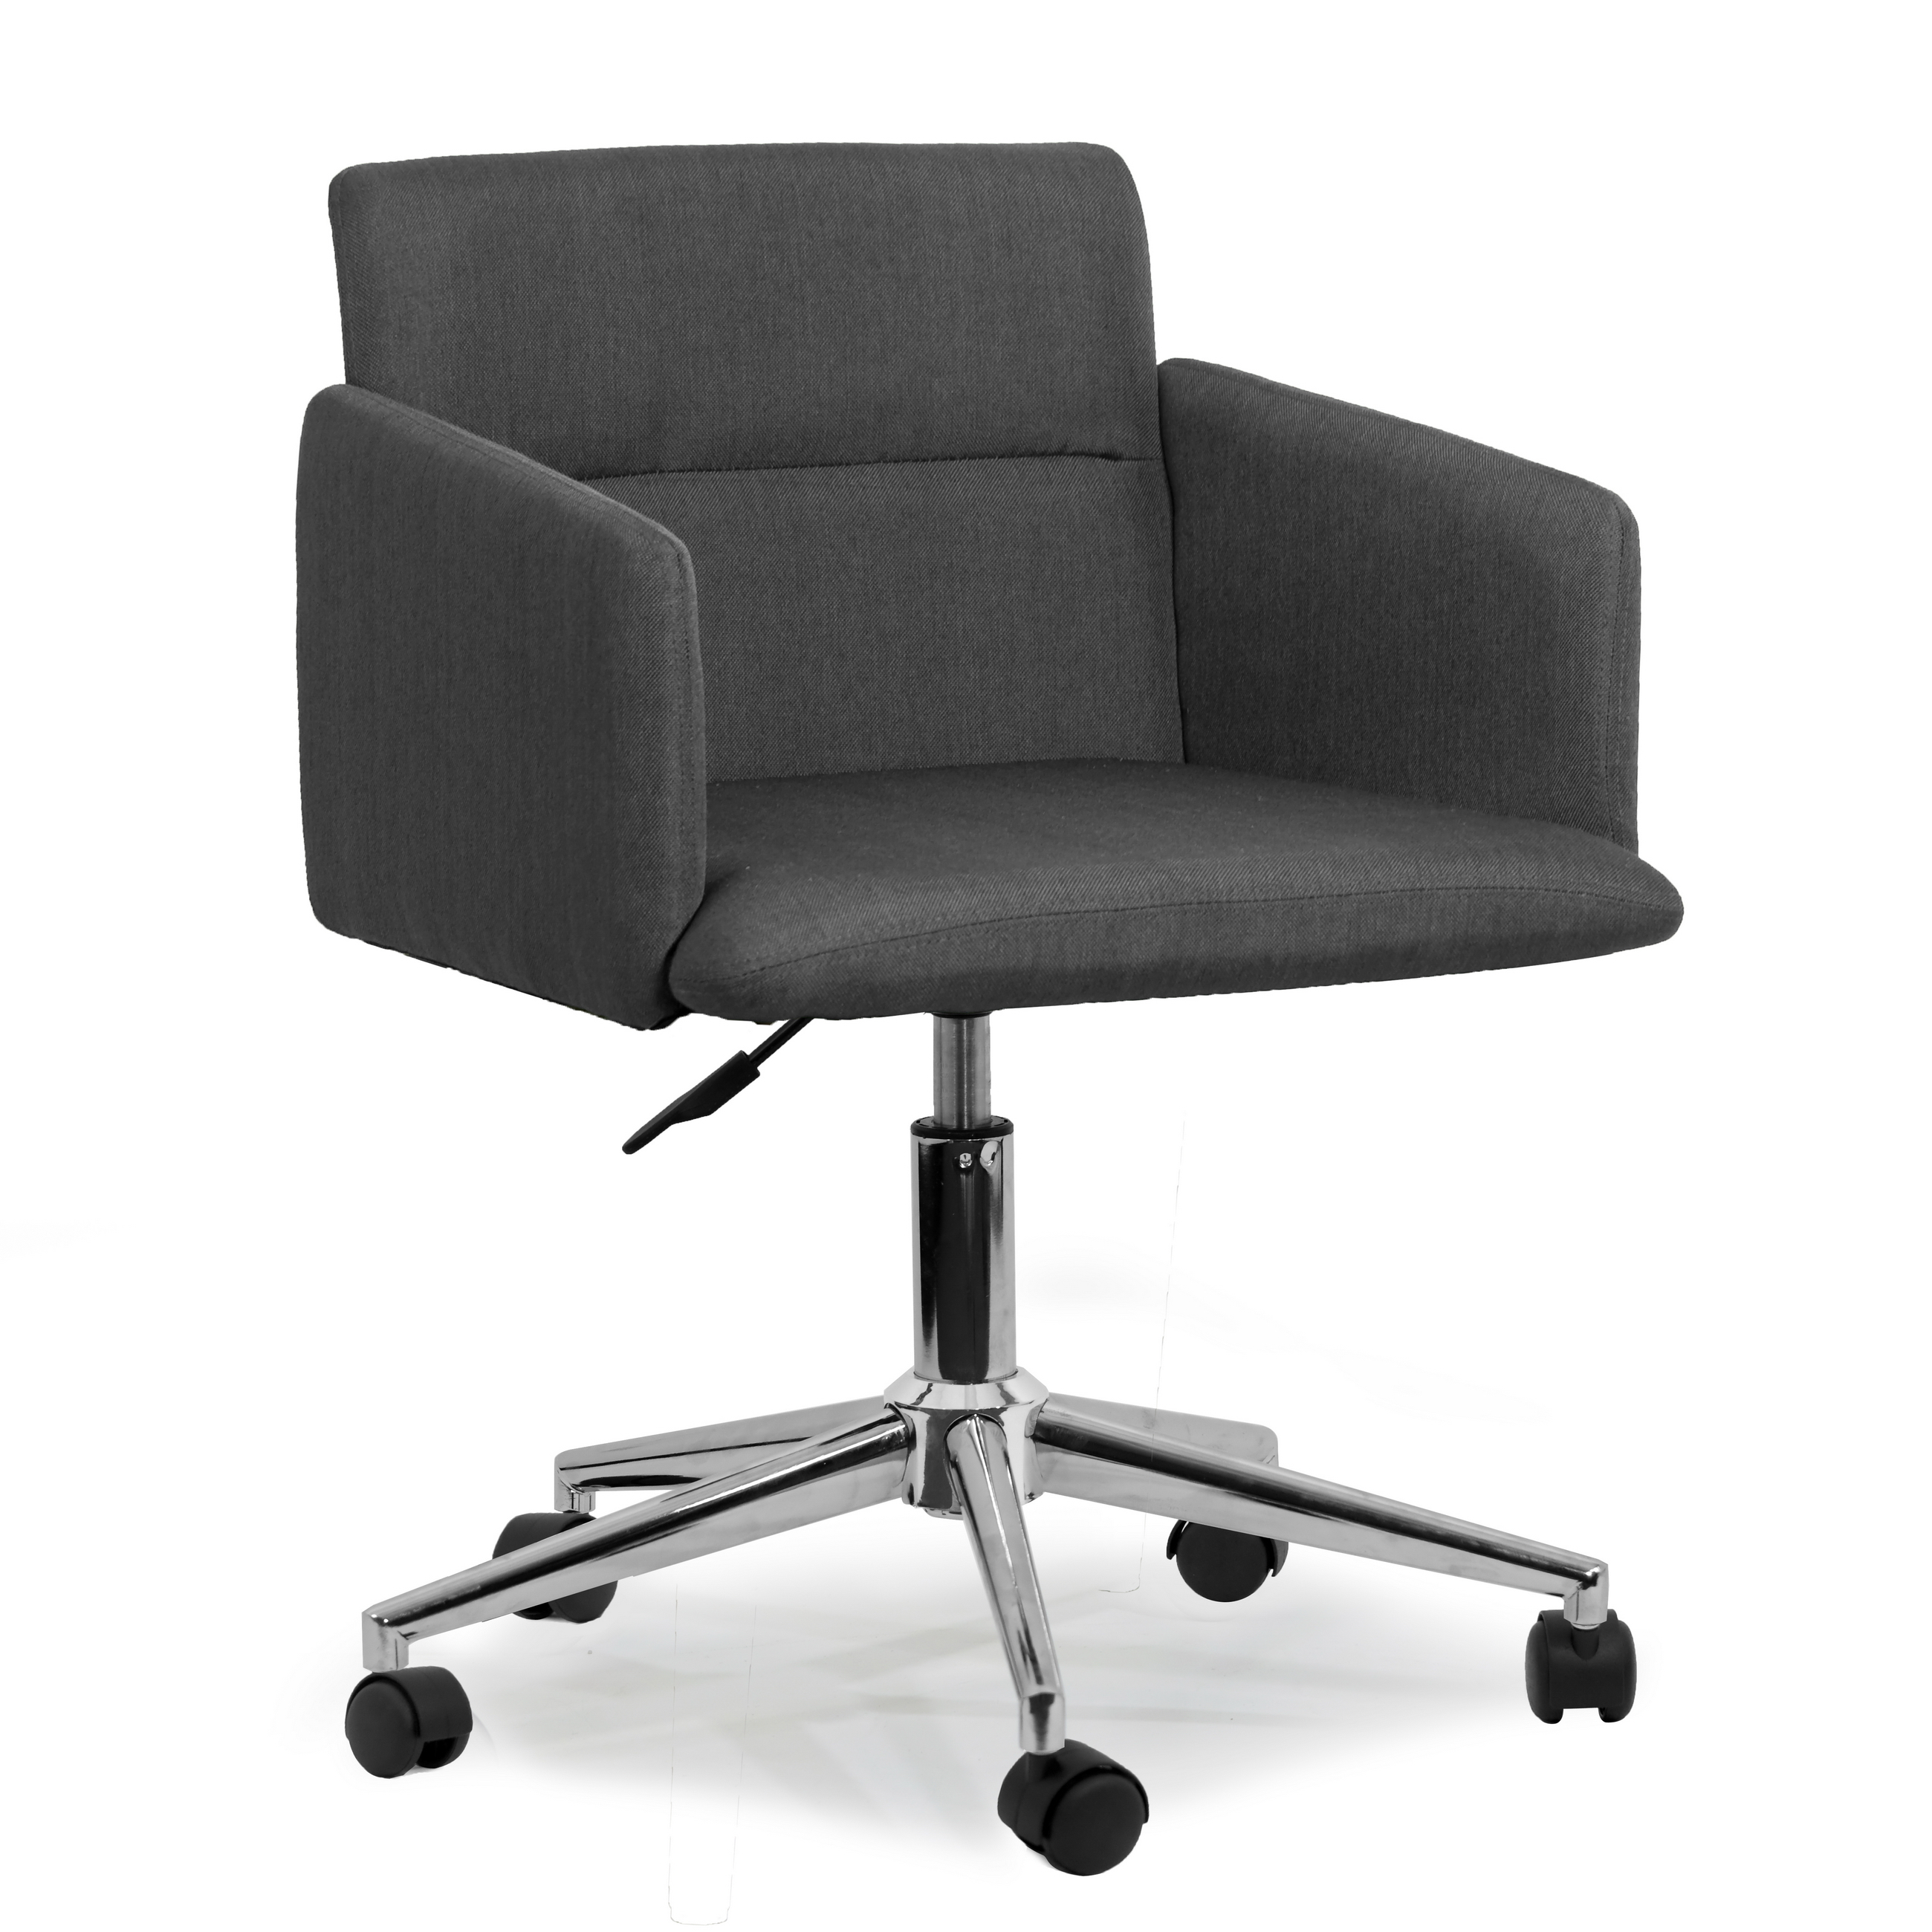 grey fabric swivel office chair ergonomic mesh uk aila dark with wheel base